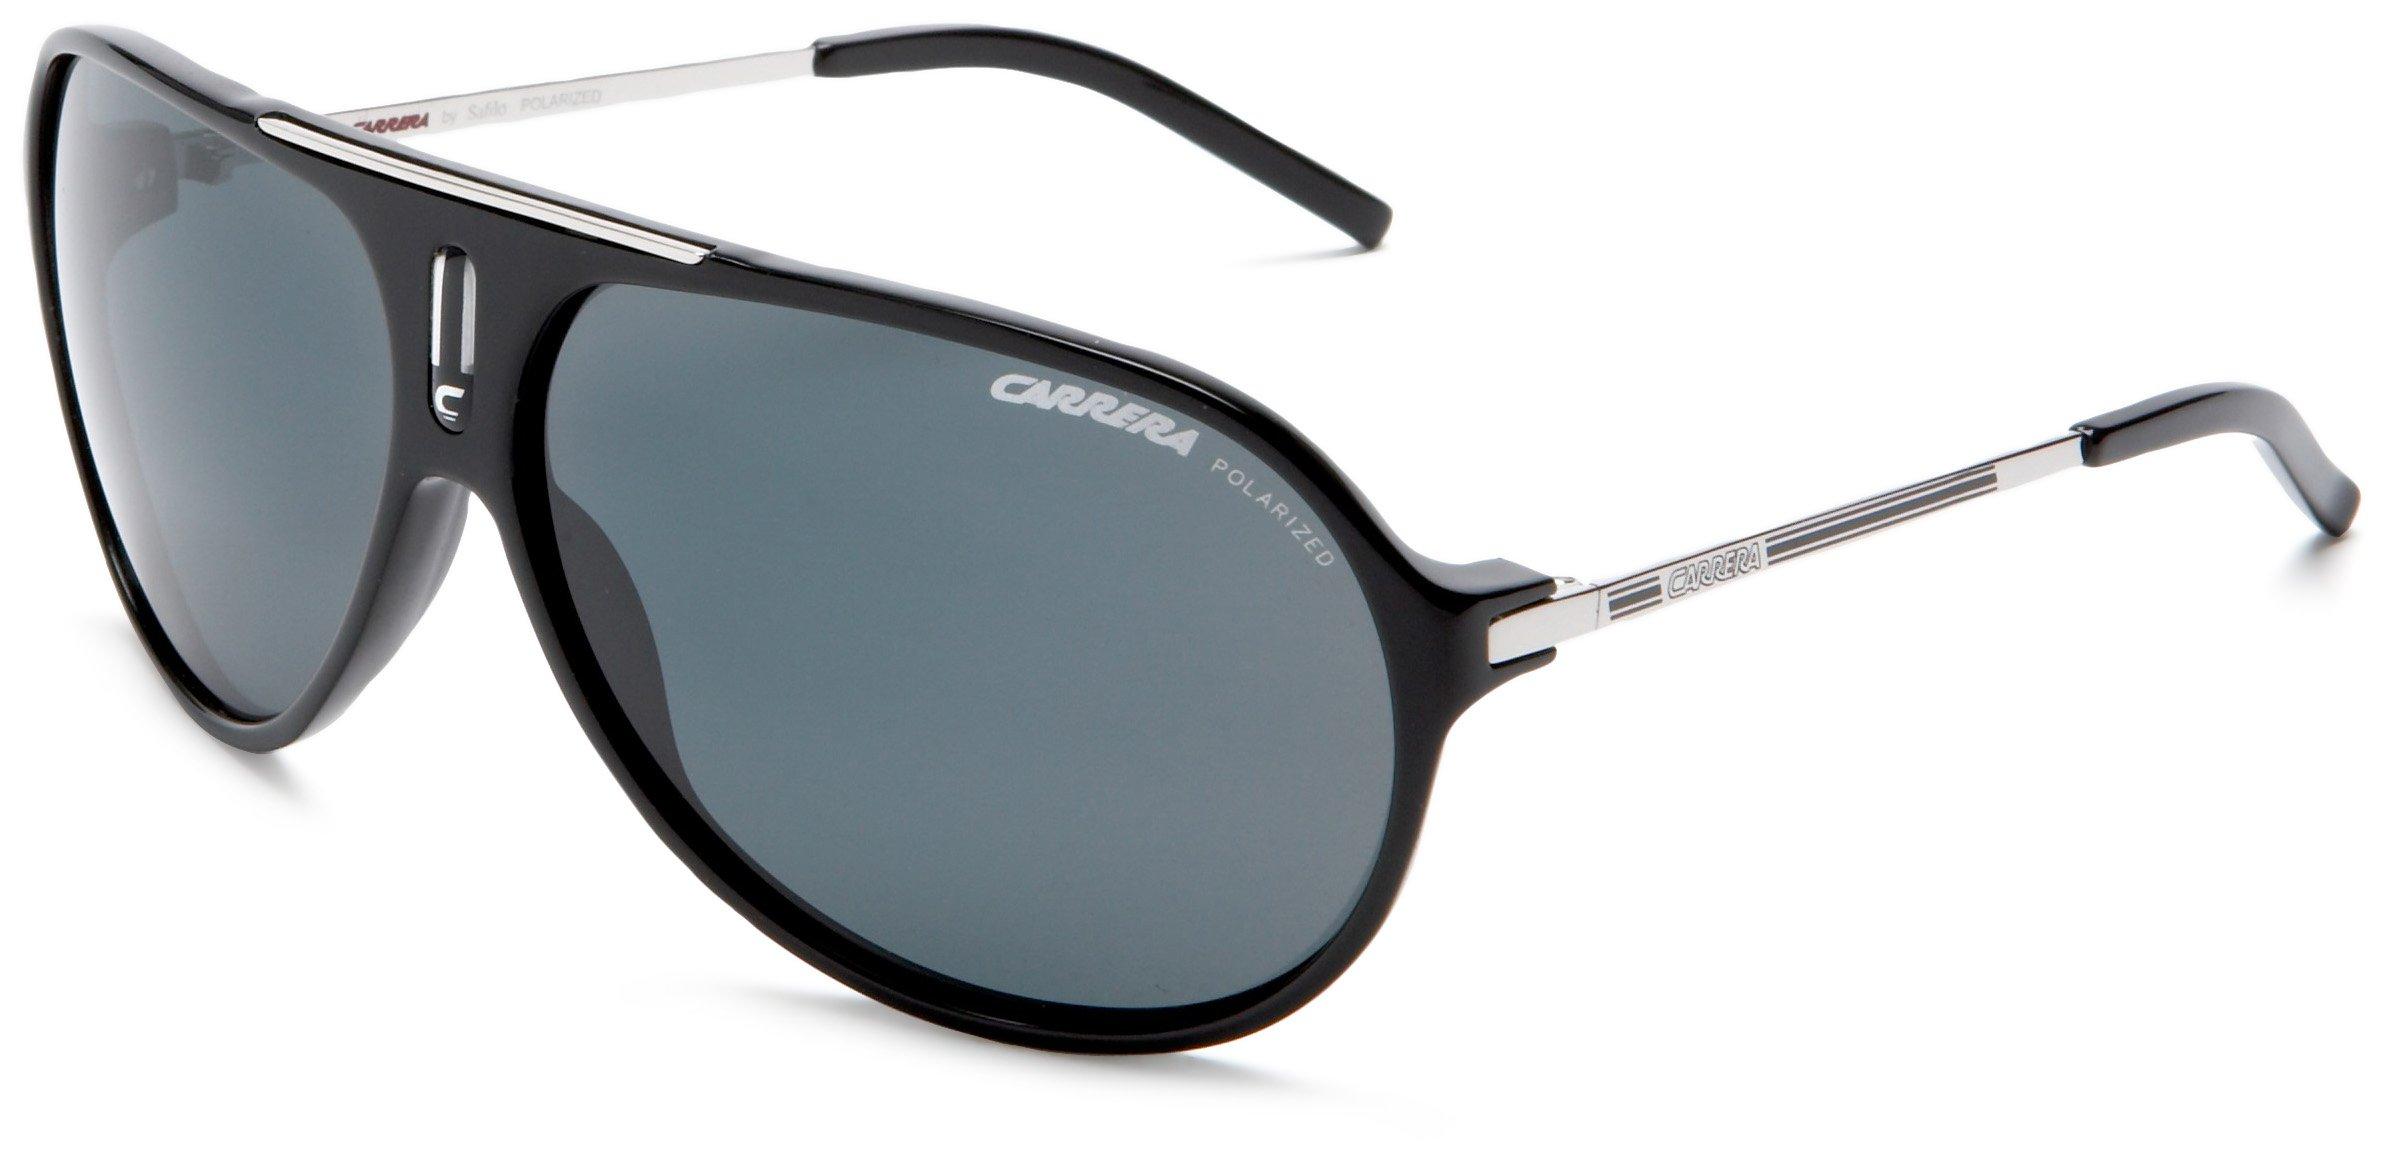 Carrera Hot Aviator Sunglasses,Black And Palladium Frame/Grey Lens,one size